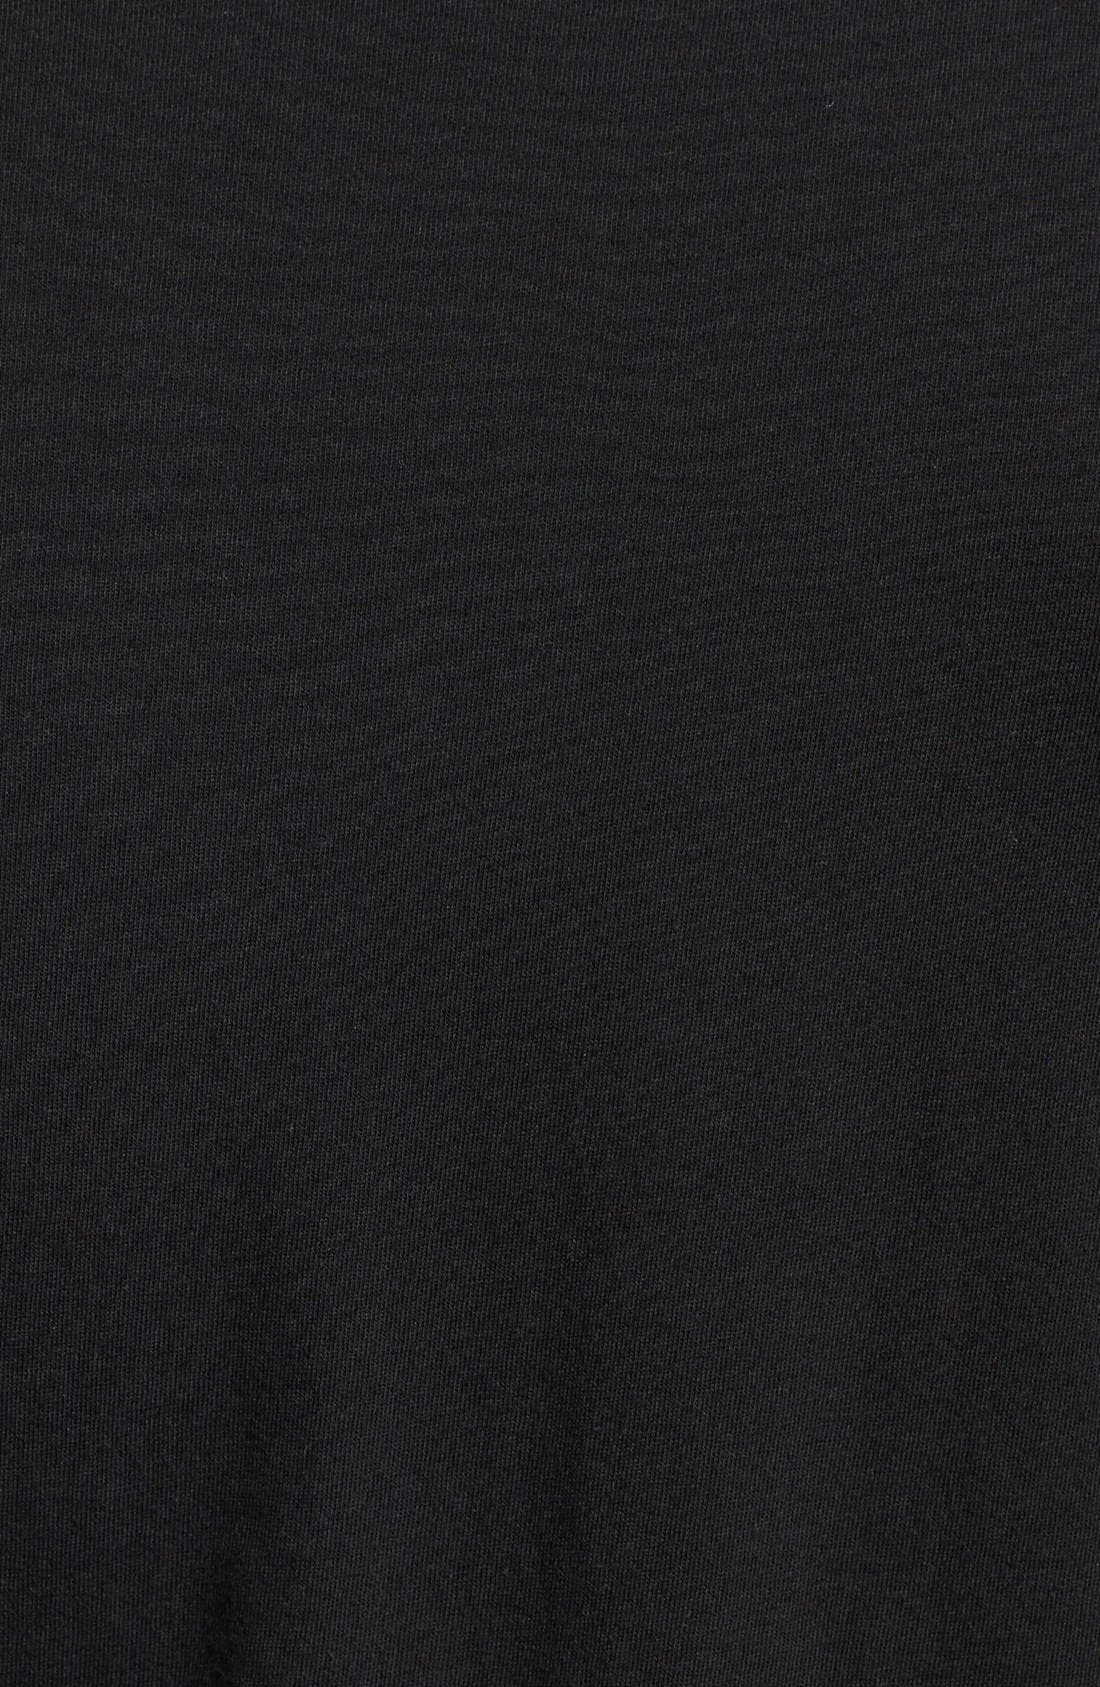 Crewneck T-Shirt,                             Alternate thumbnail 5, color,                             Black